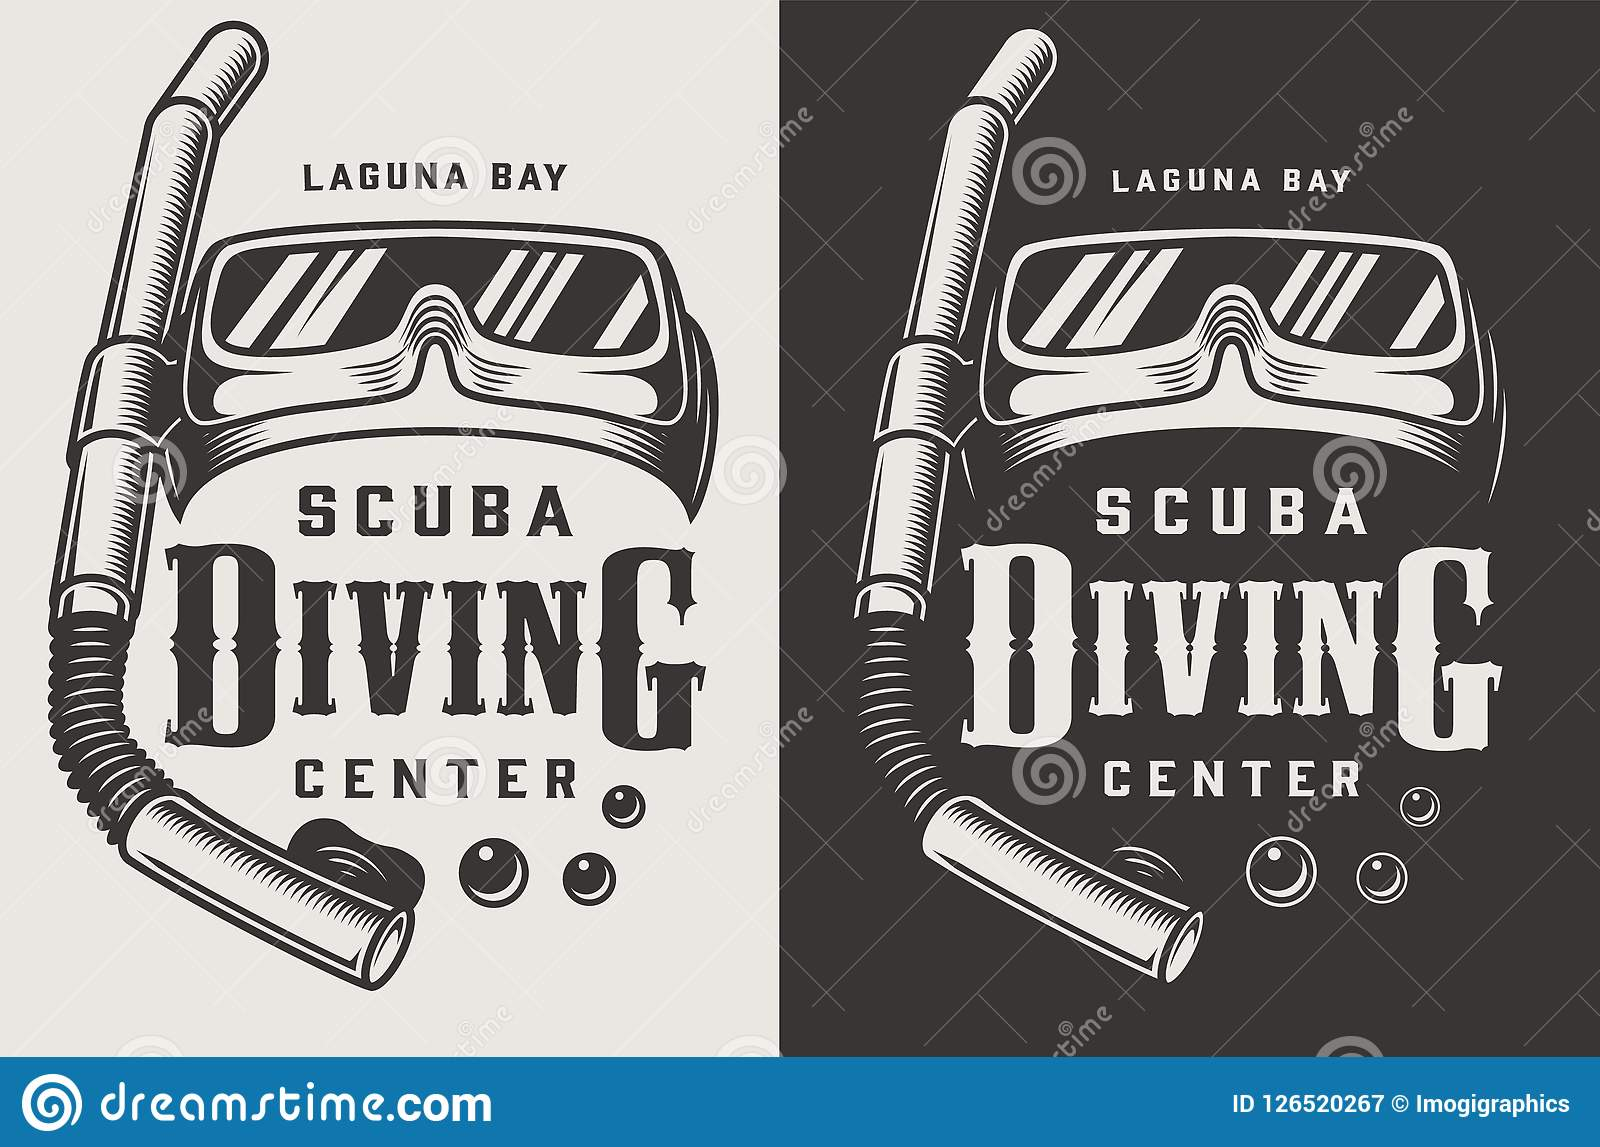 Vintage diving center monochrome logotypes